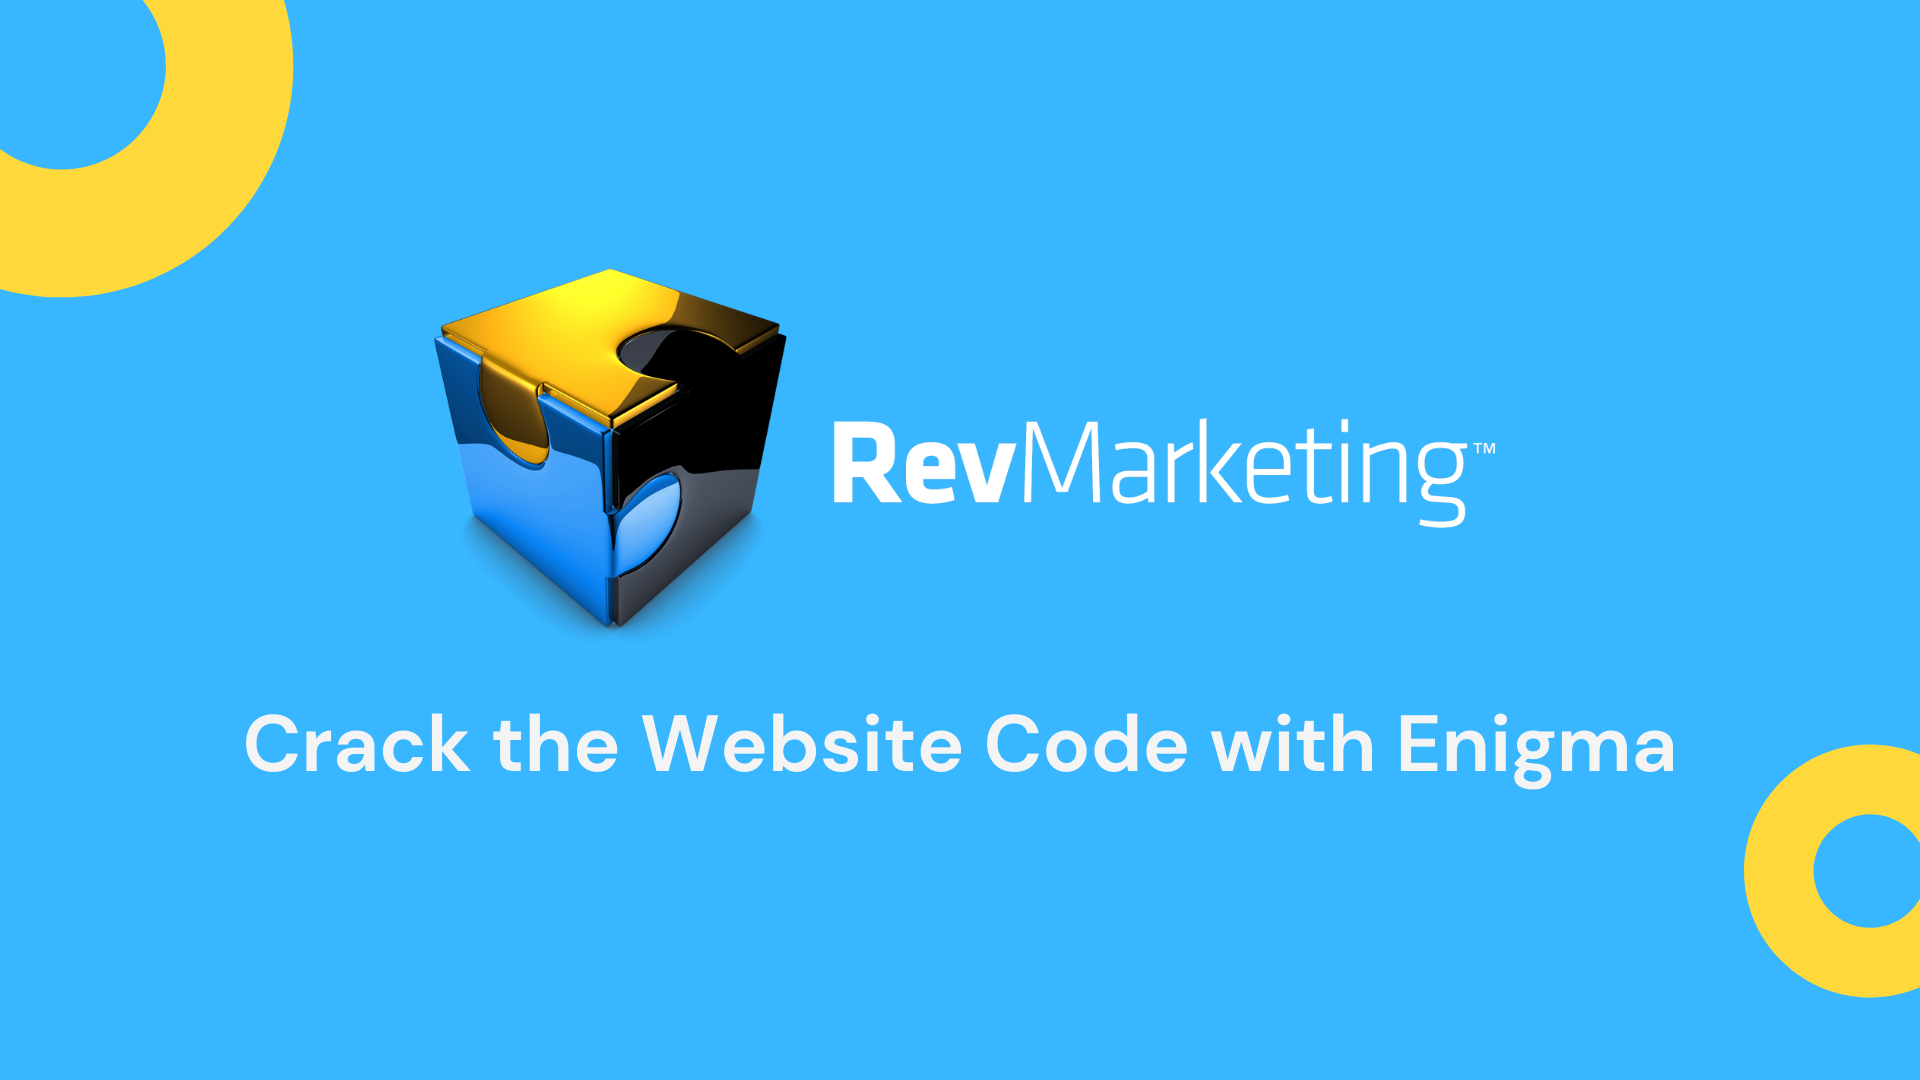 rev marketing logo with circles